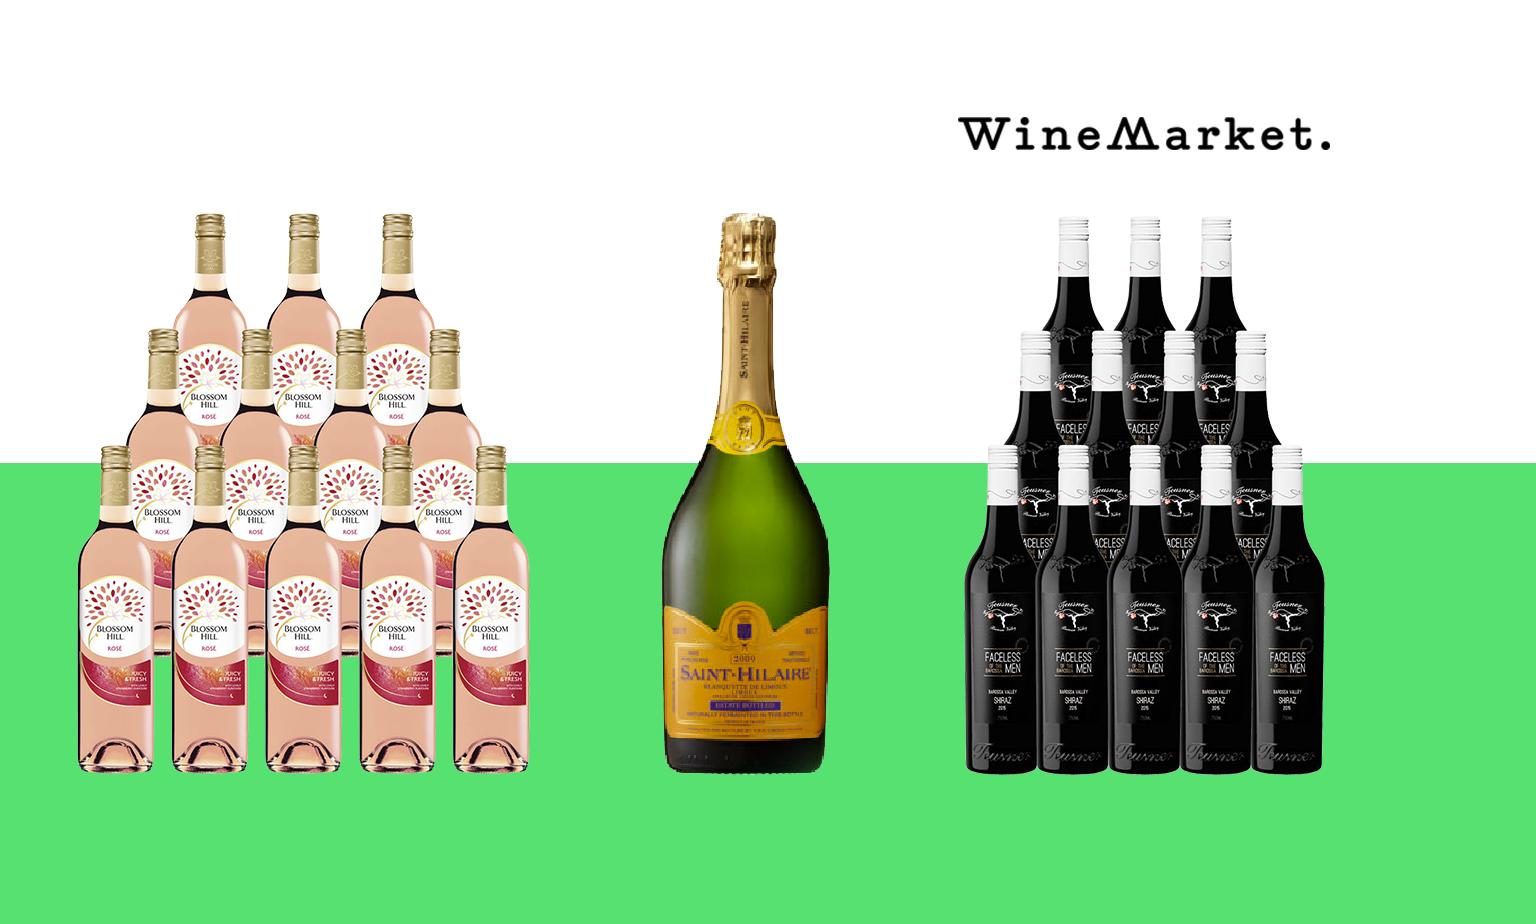 20% off at Winemarket*